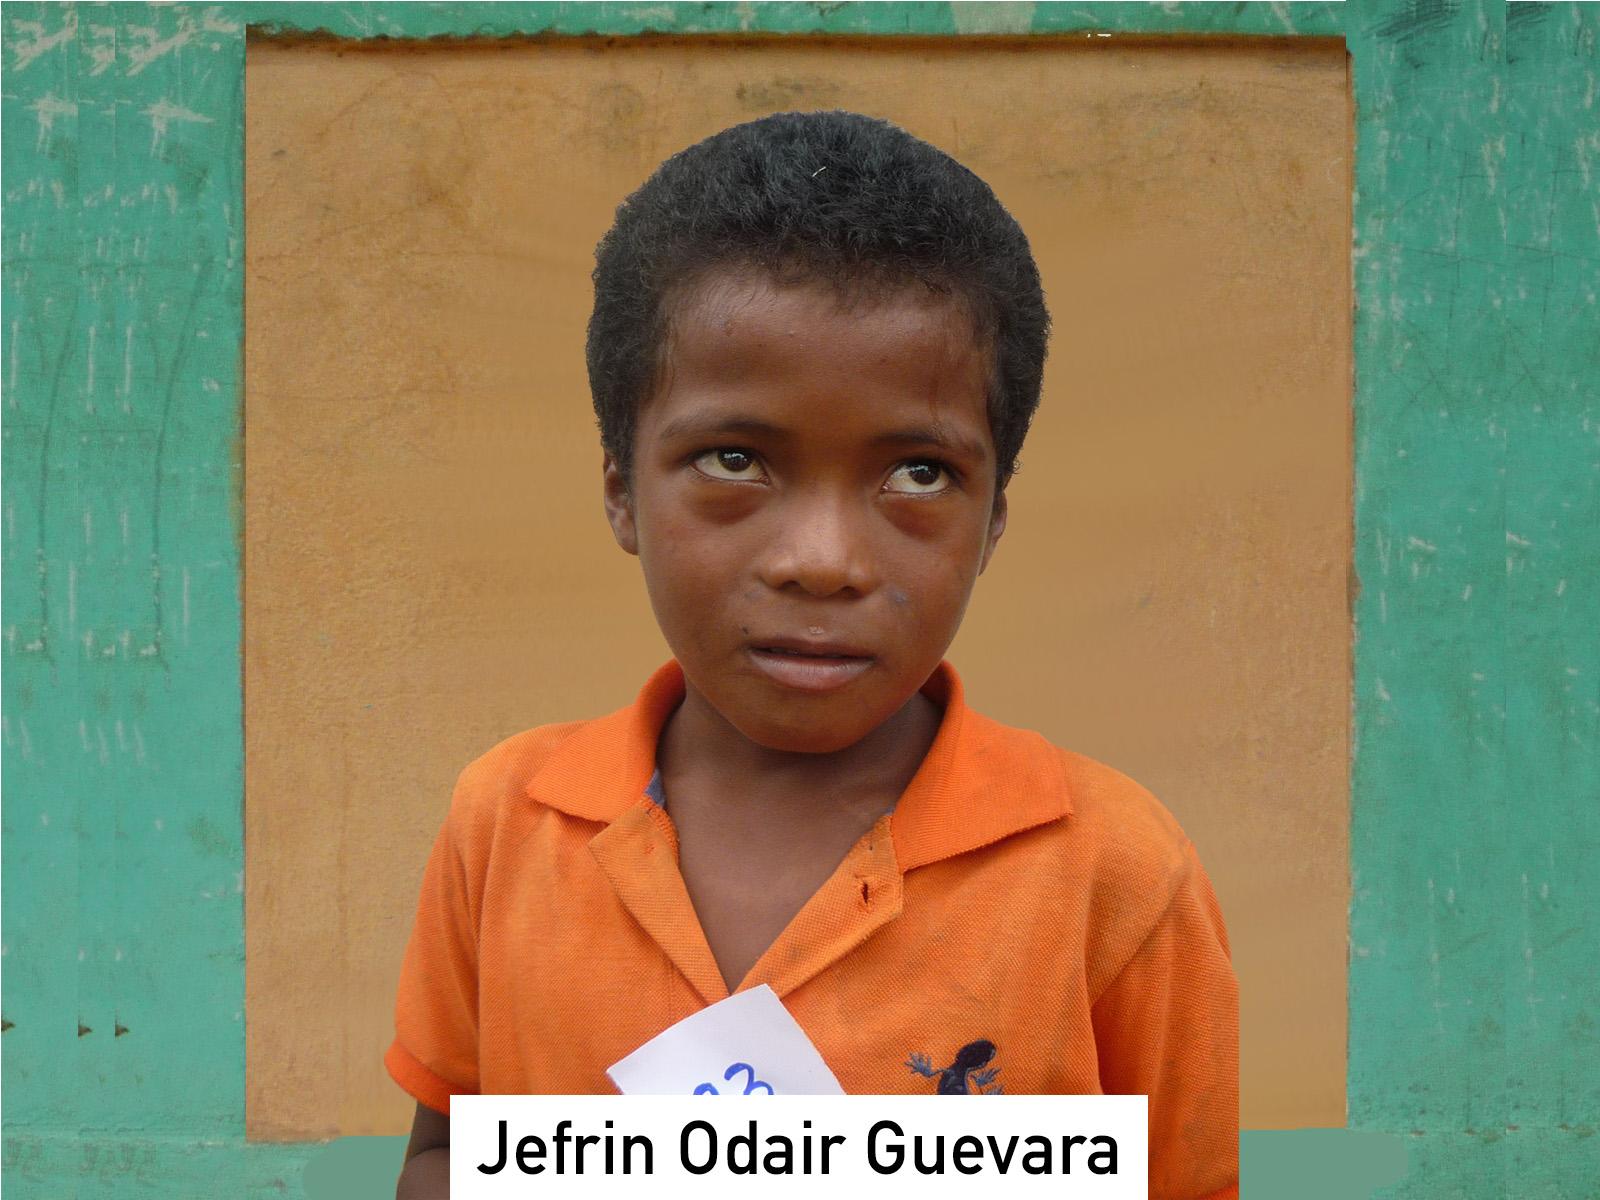 023 - Jefrin Odair Guevara.jpg